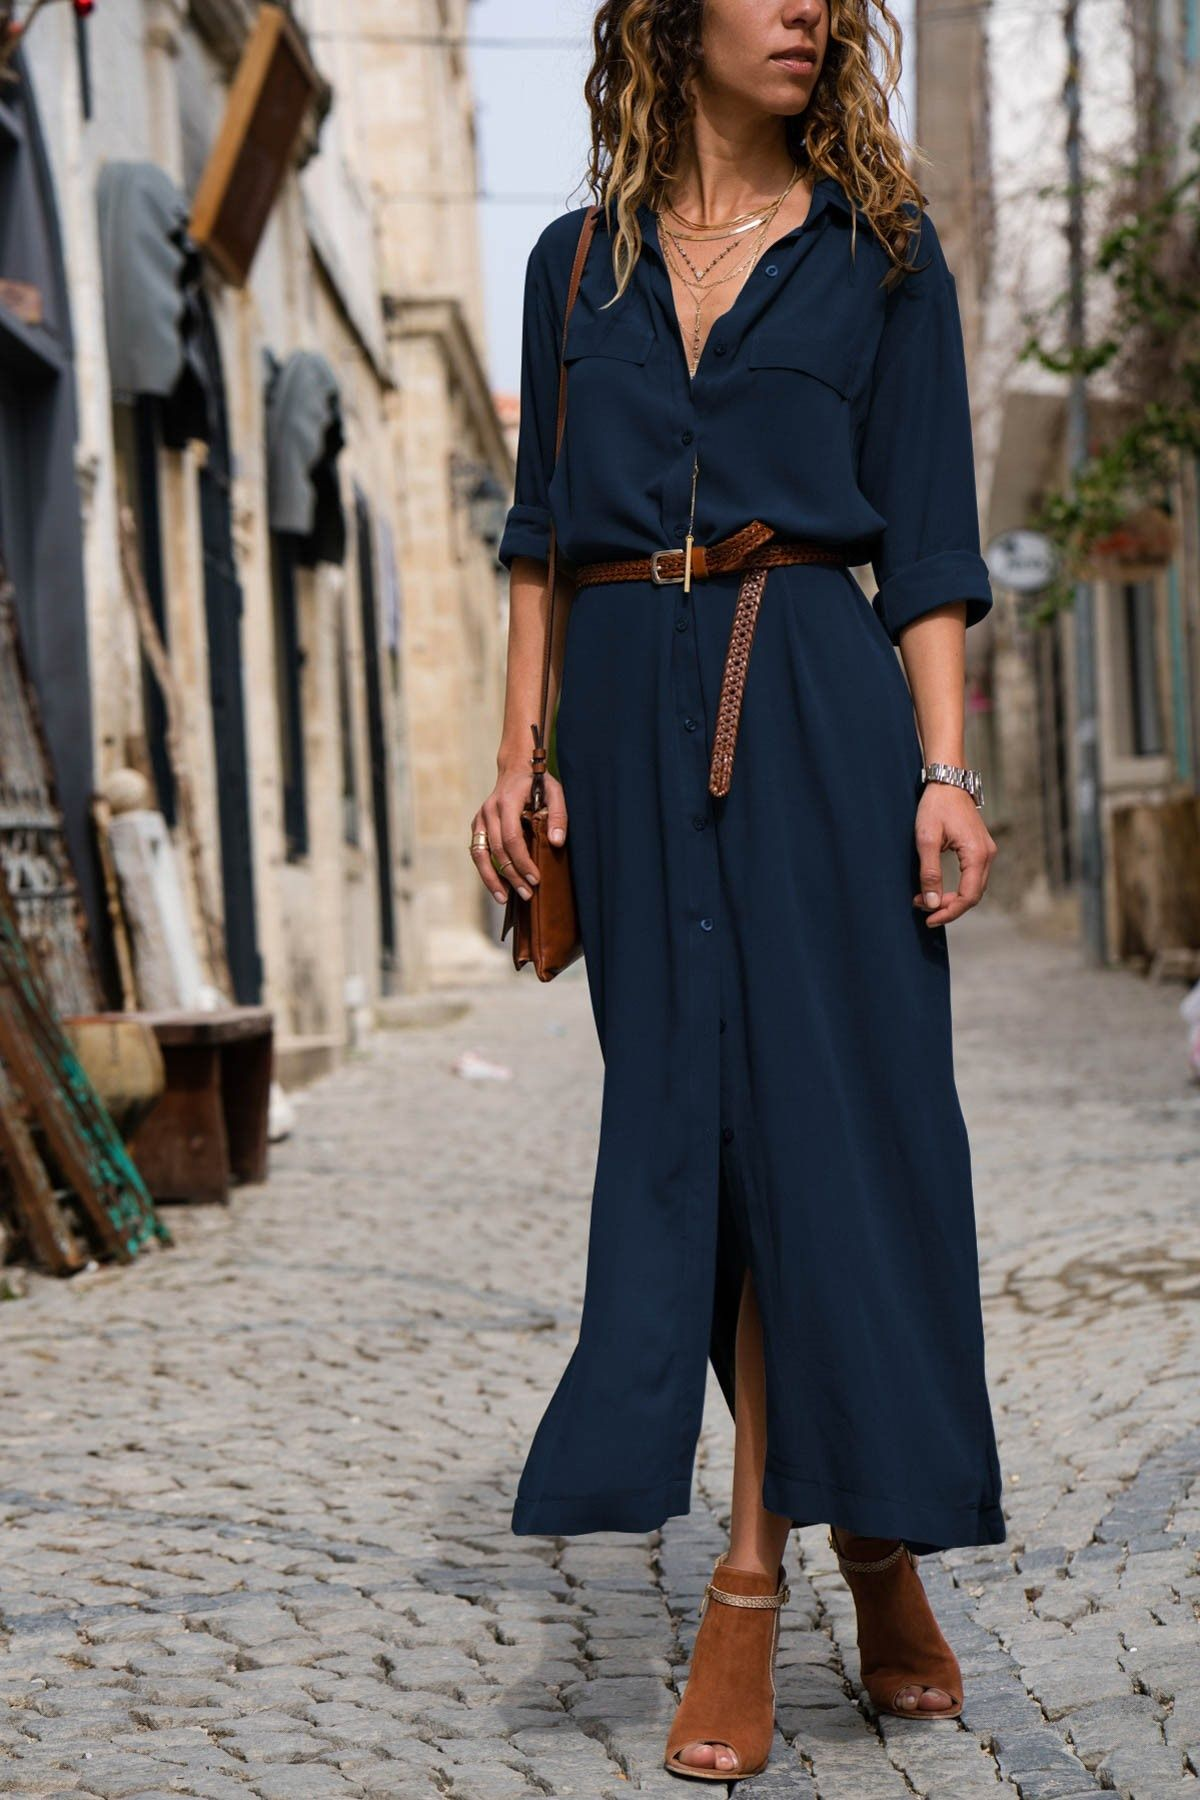 Kadin Lacivert Yani Yirtmacli Gomlek Elbise Trend Alacati Stili Trendyol Gomlek Elbise Kiyafet Elbise